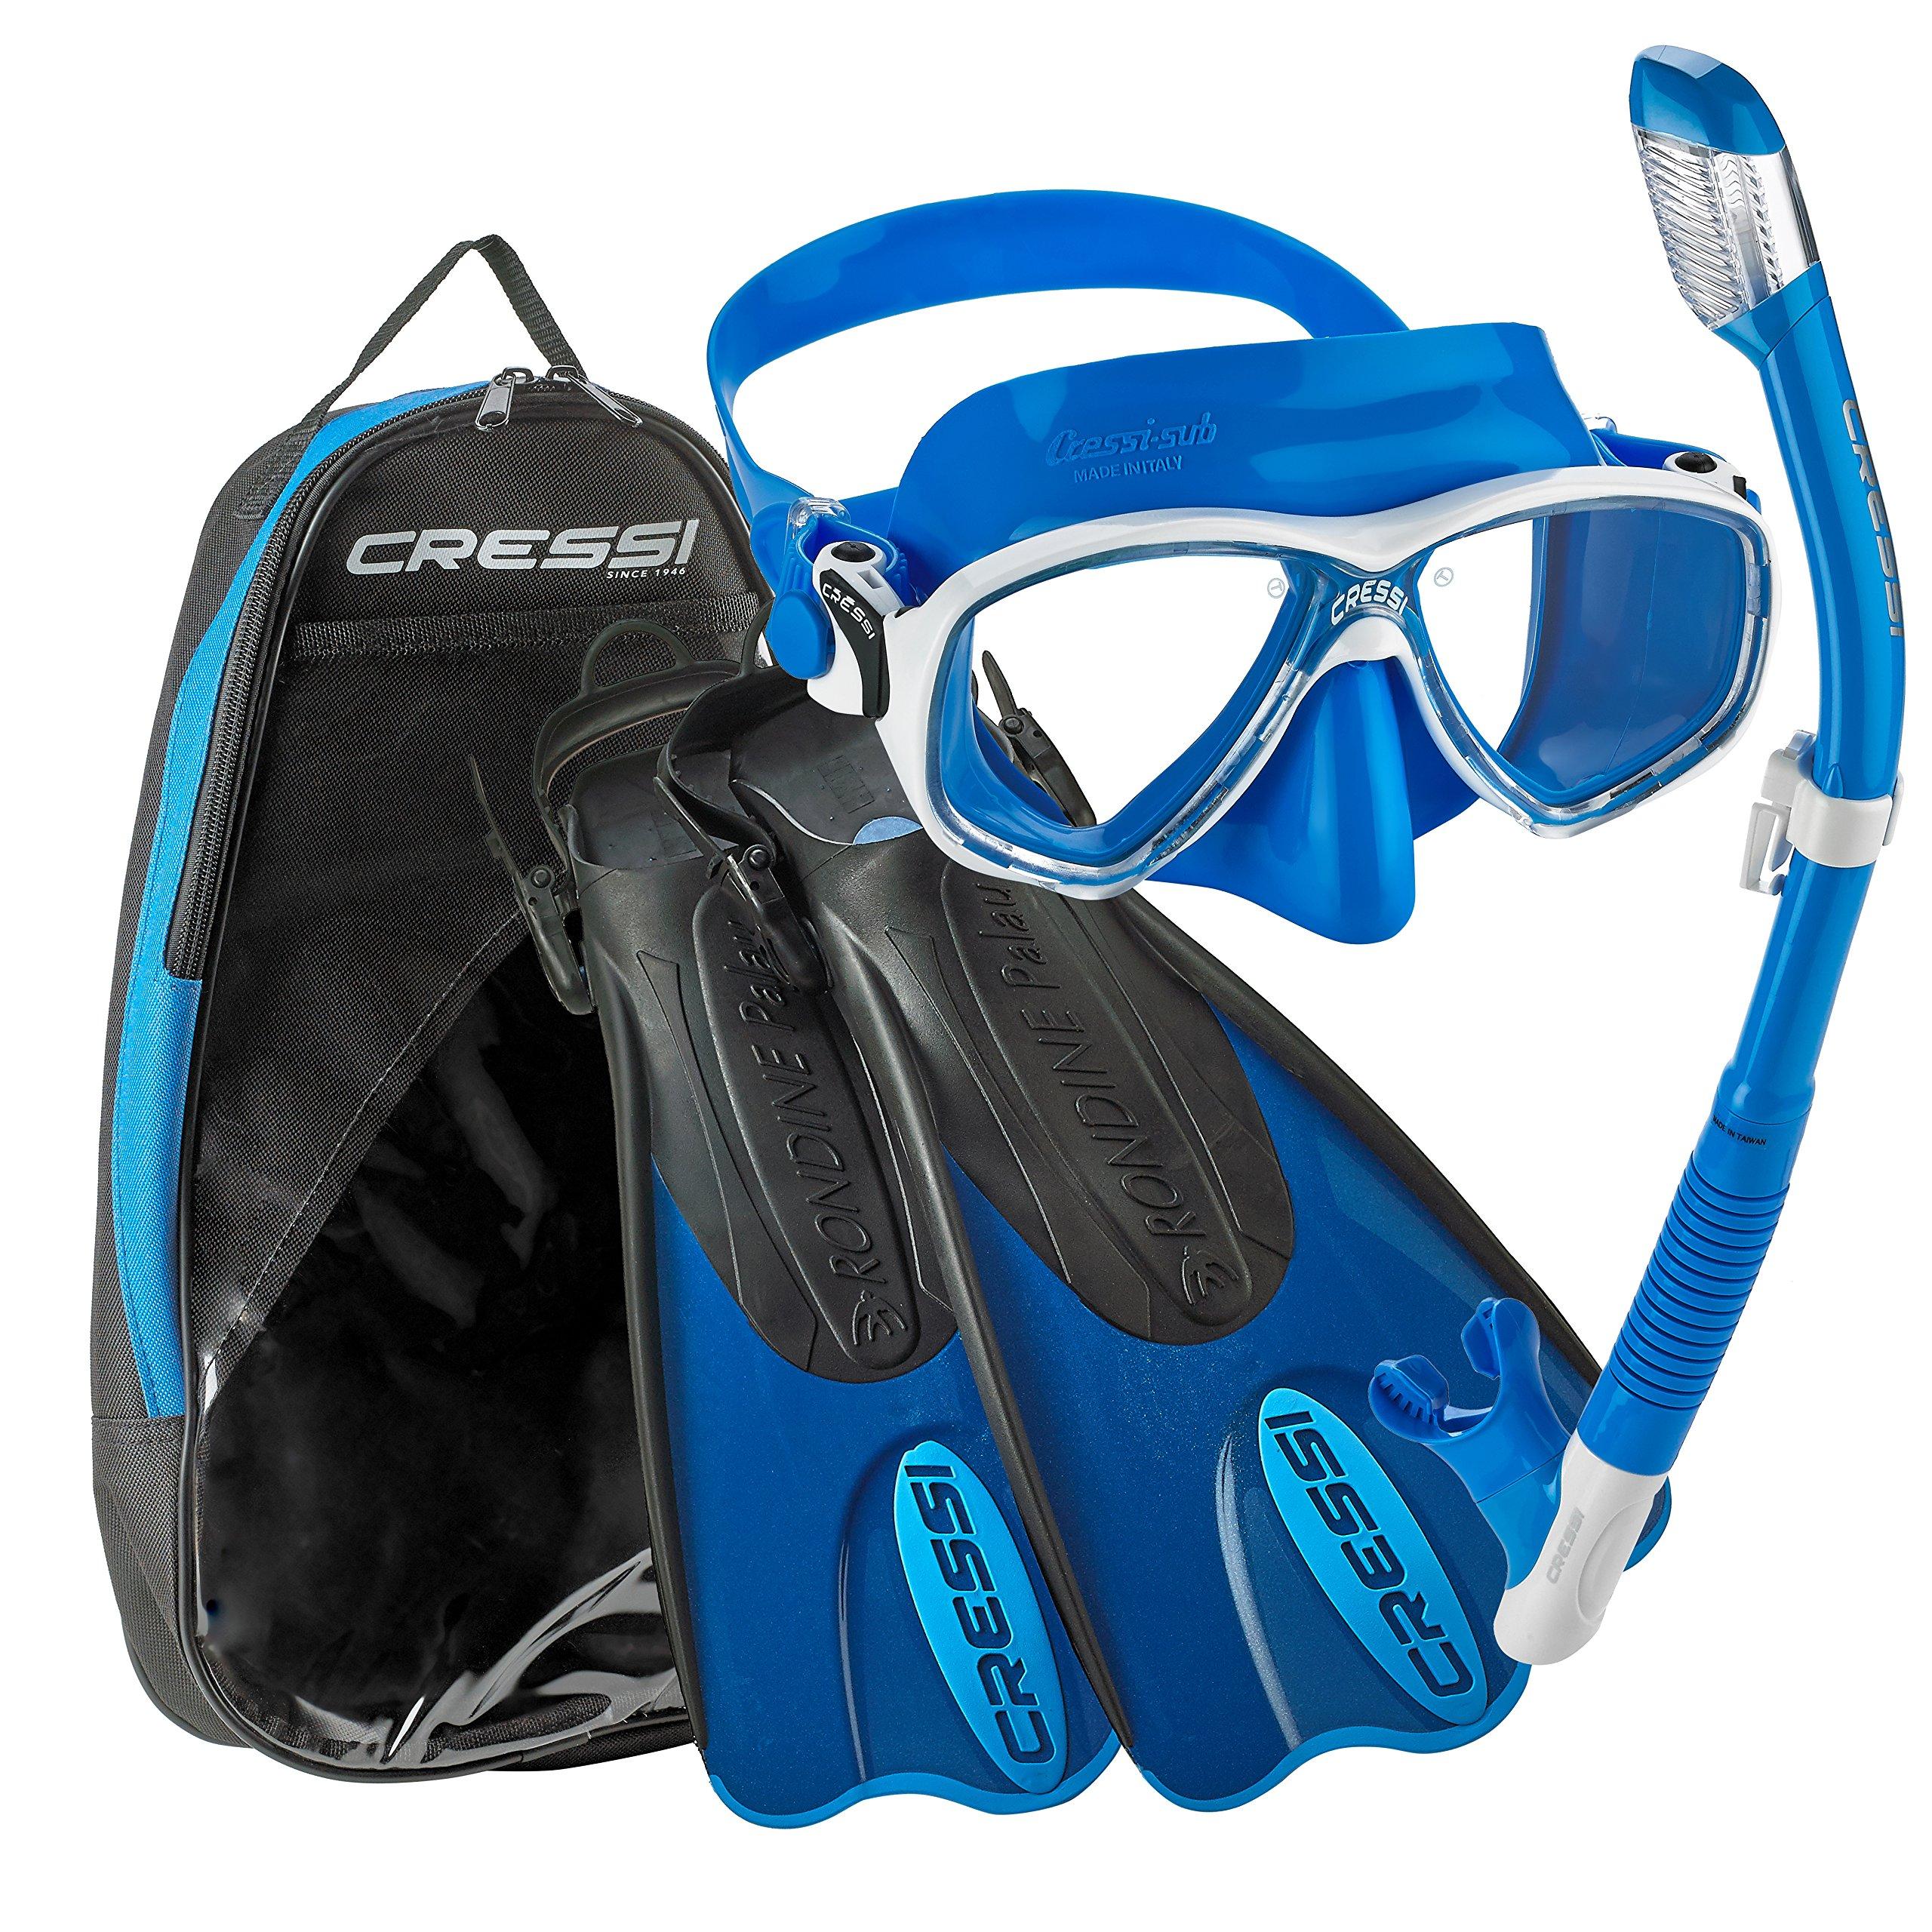 Cressi Made in Italy Palau Short Brisbane Mask Fin Snorkel Set, BL-XS